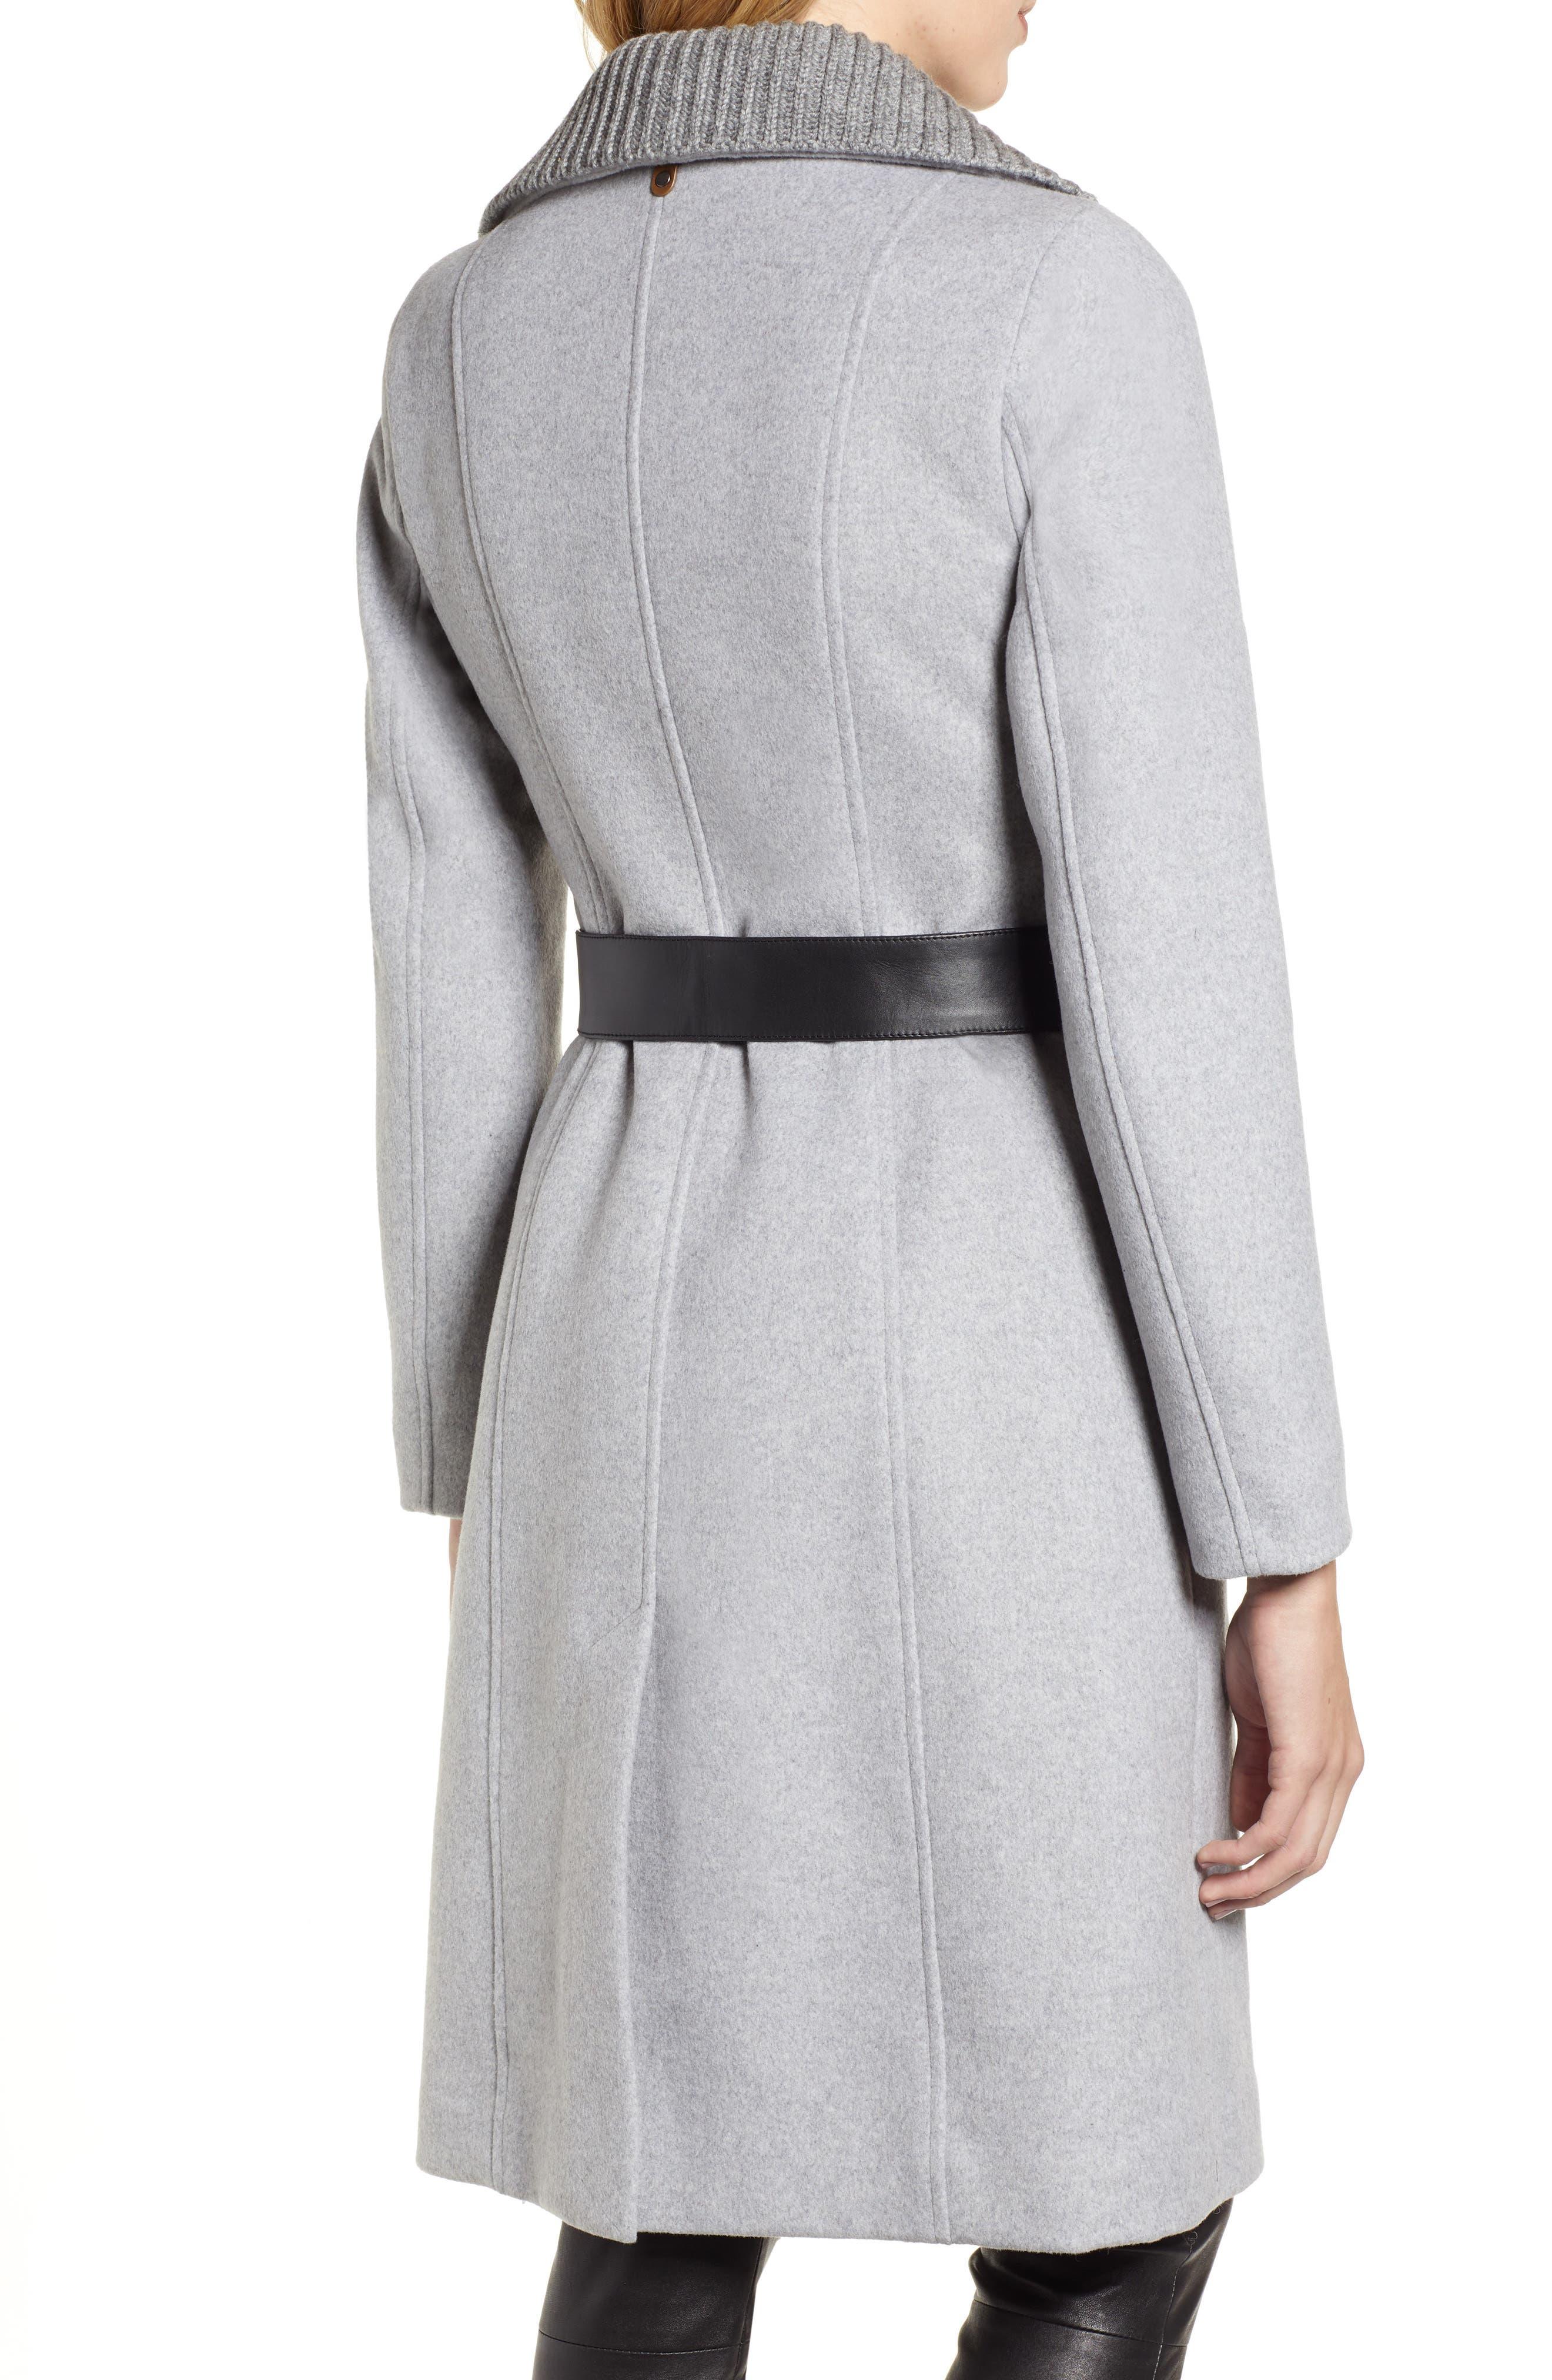 MACKAGE, Nori Belted Wool Blend Coat, Alternate thumbnail 2, color, LIGHT GREY